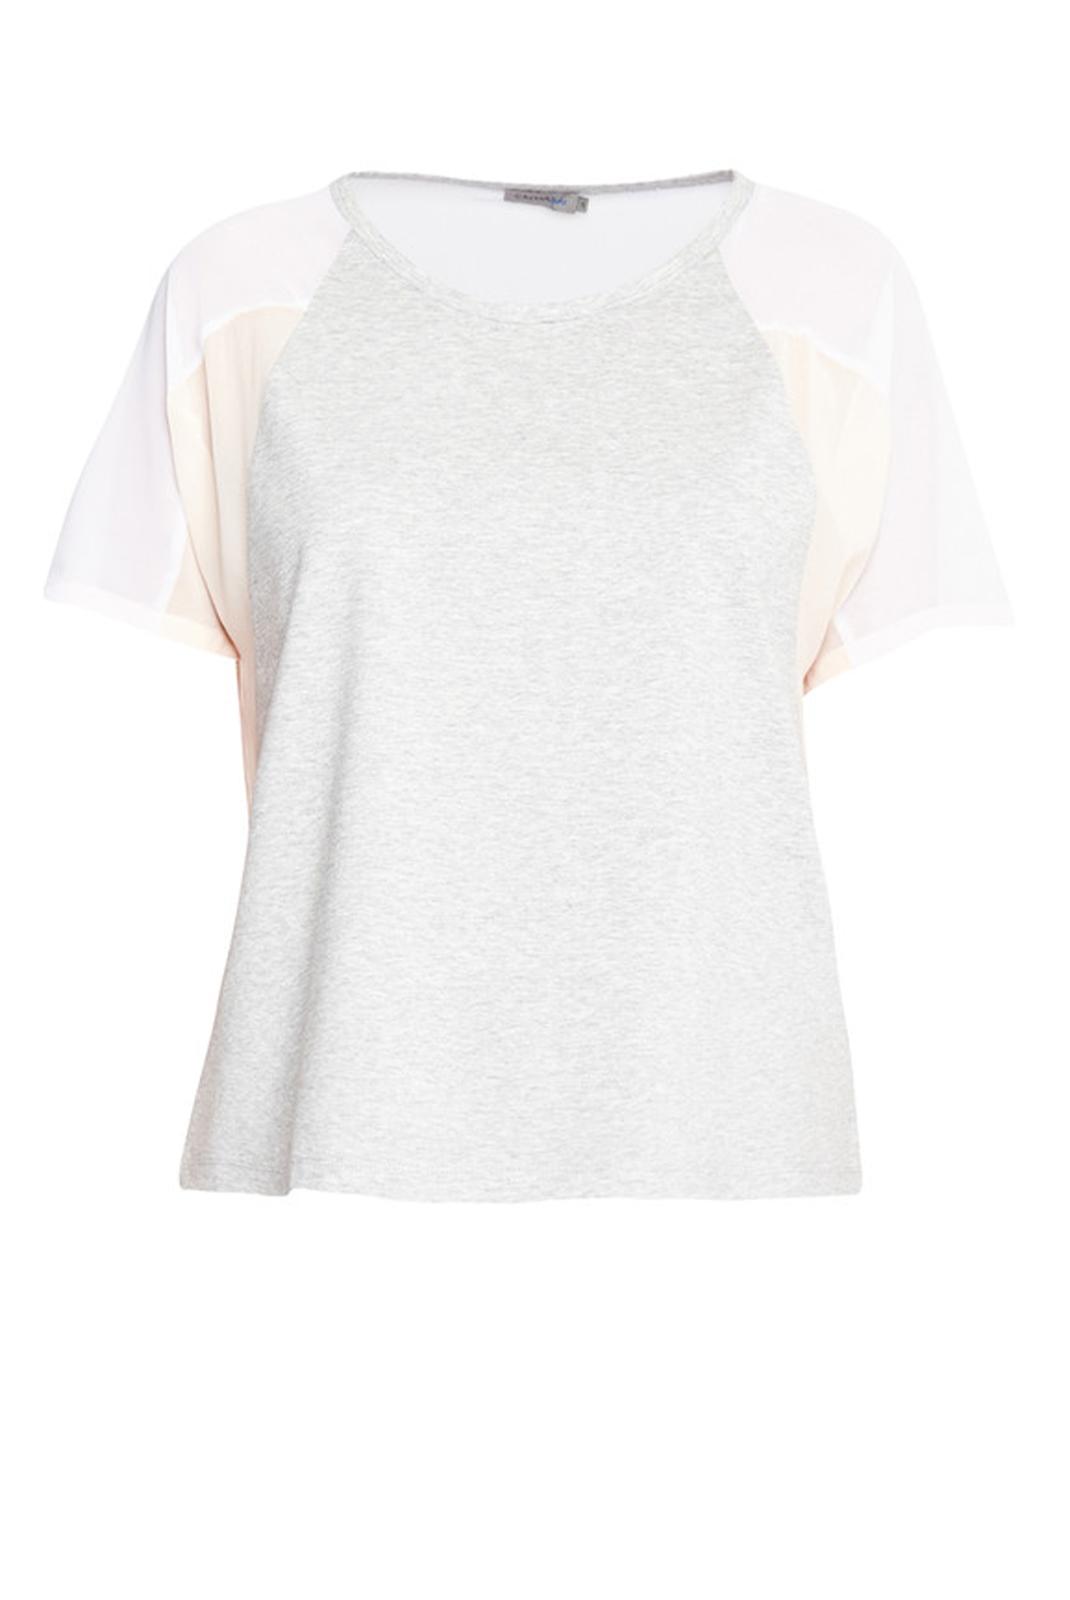 Tops & Tee shirts  Calvin klein J20J205397 038 GRIS